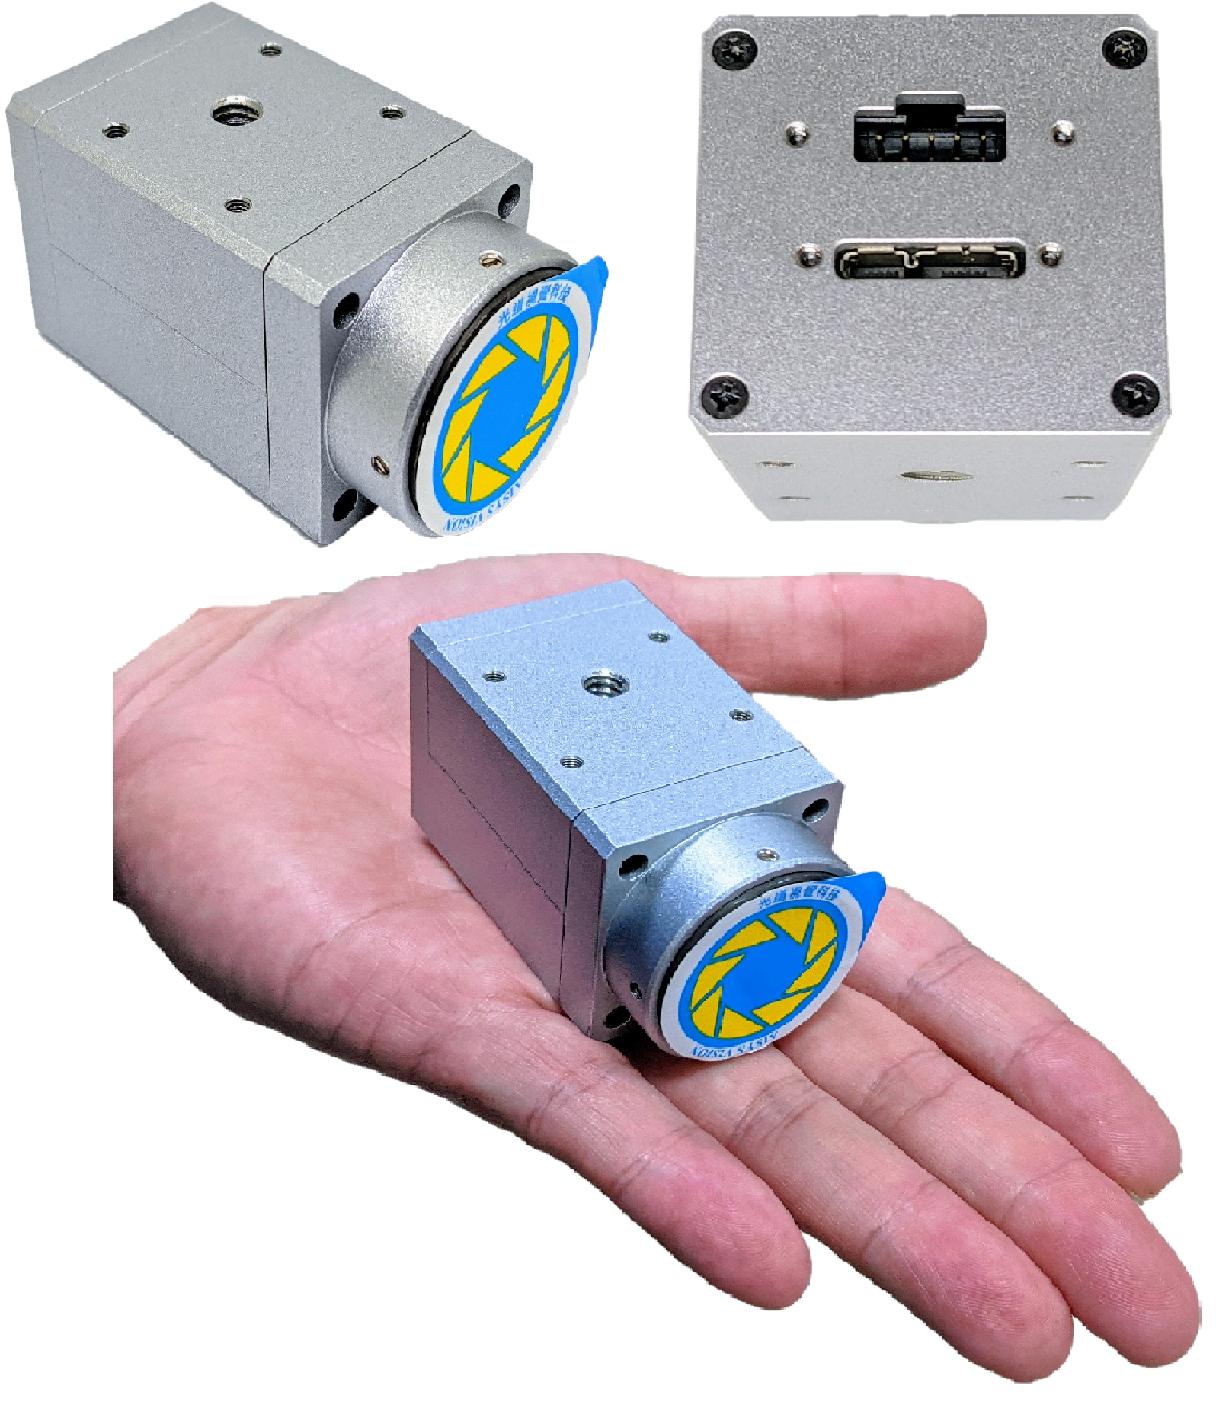 CYCLOPS SU30F-435攝影機-300K像素、非同步式、灰階、內建LED燈源控制器